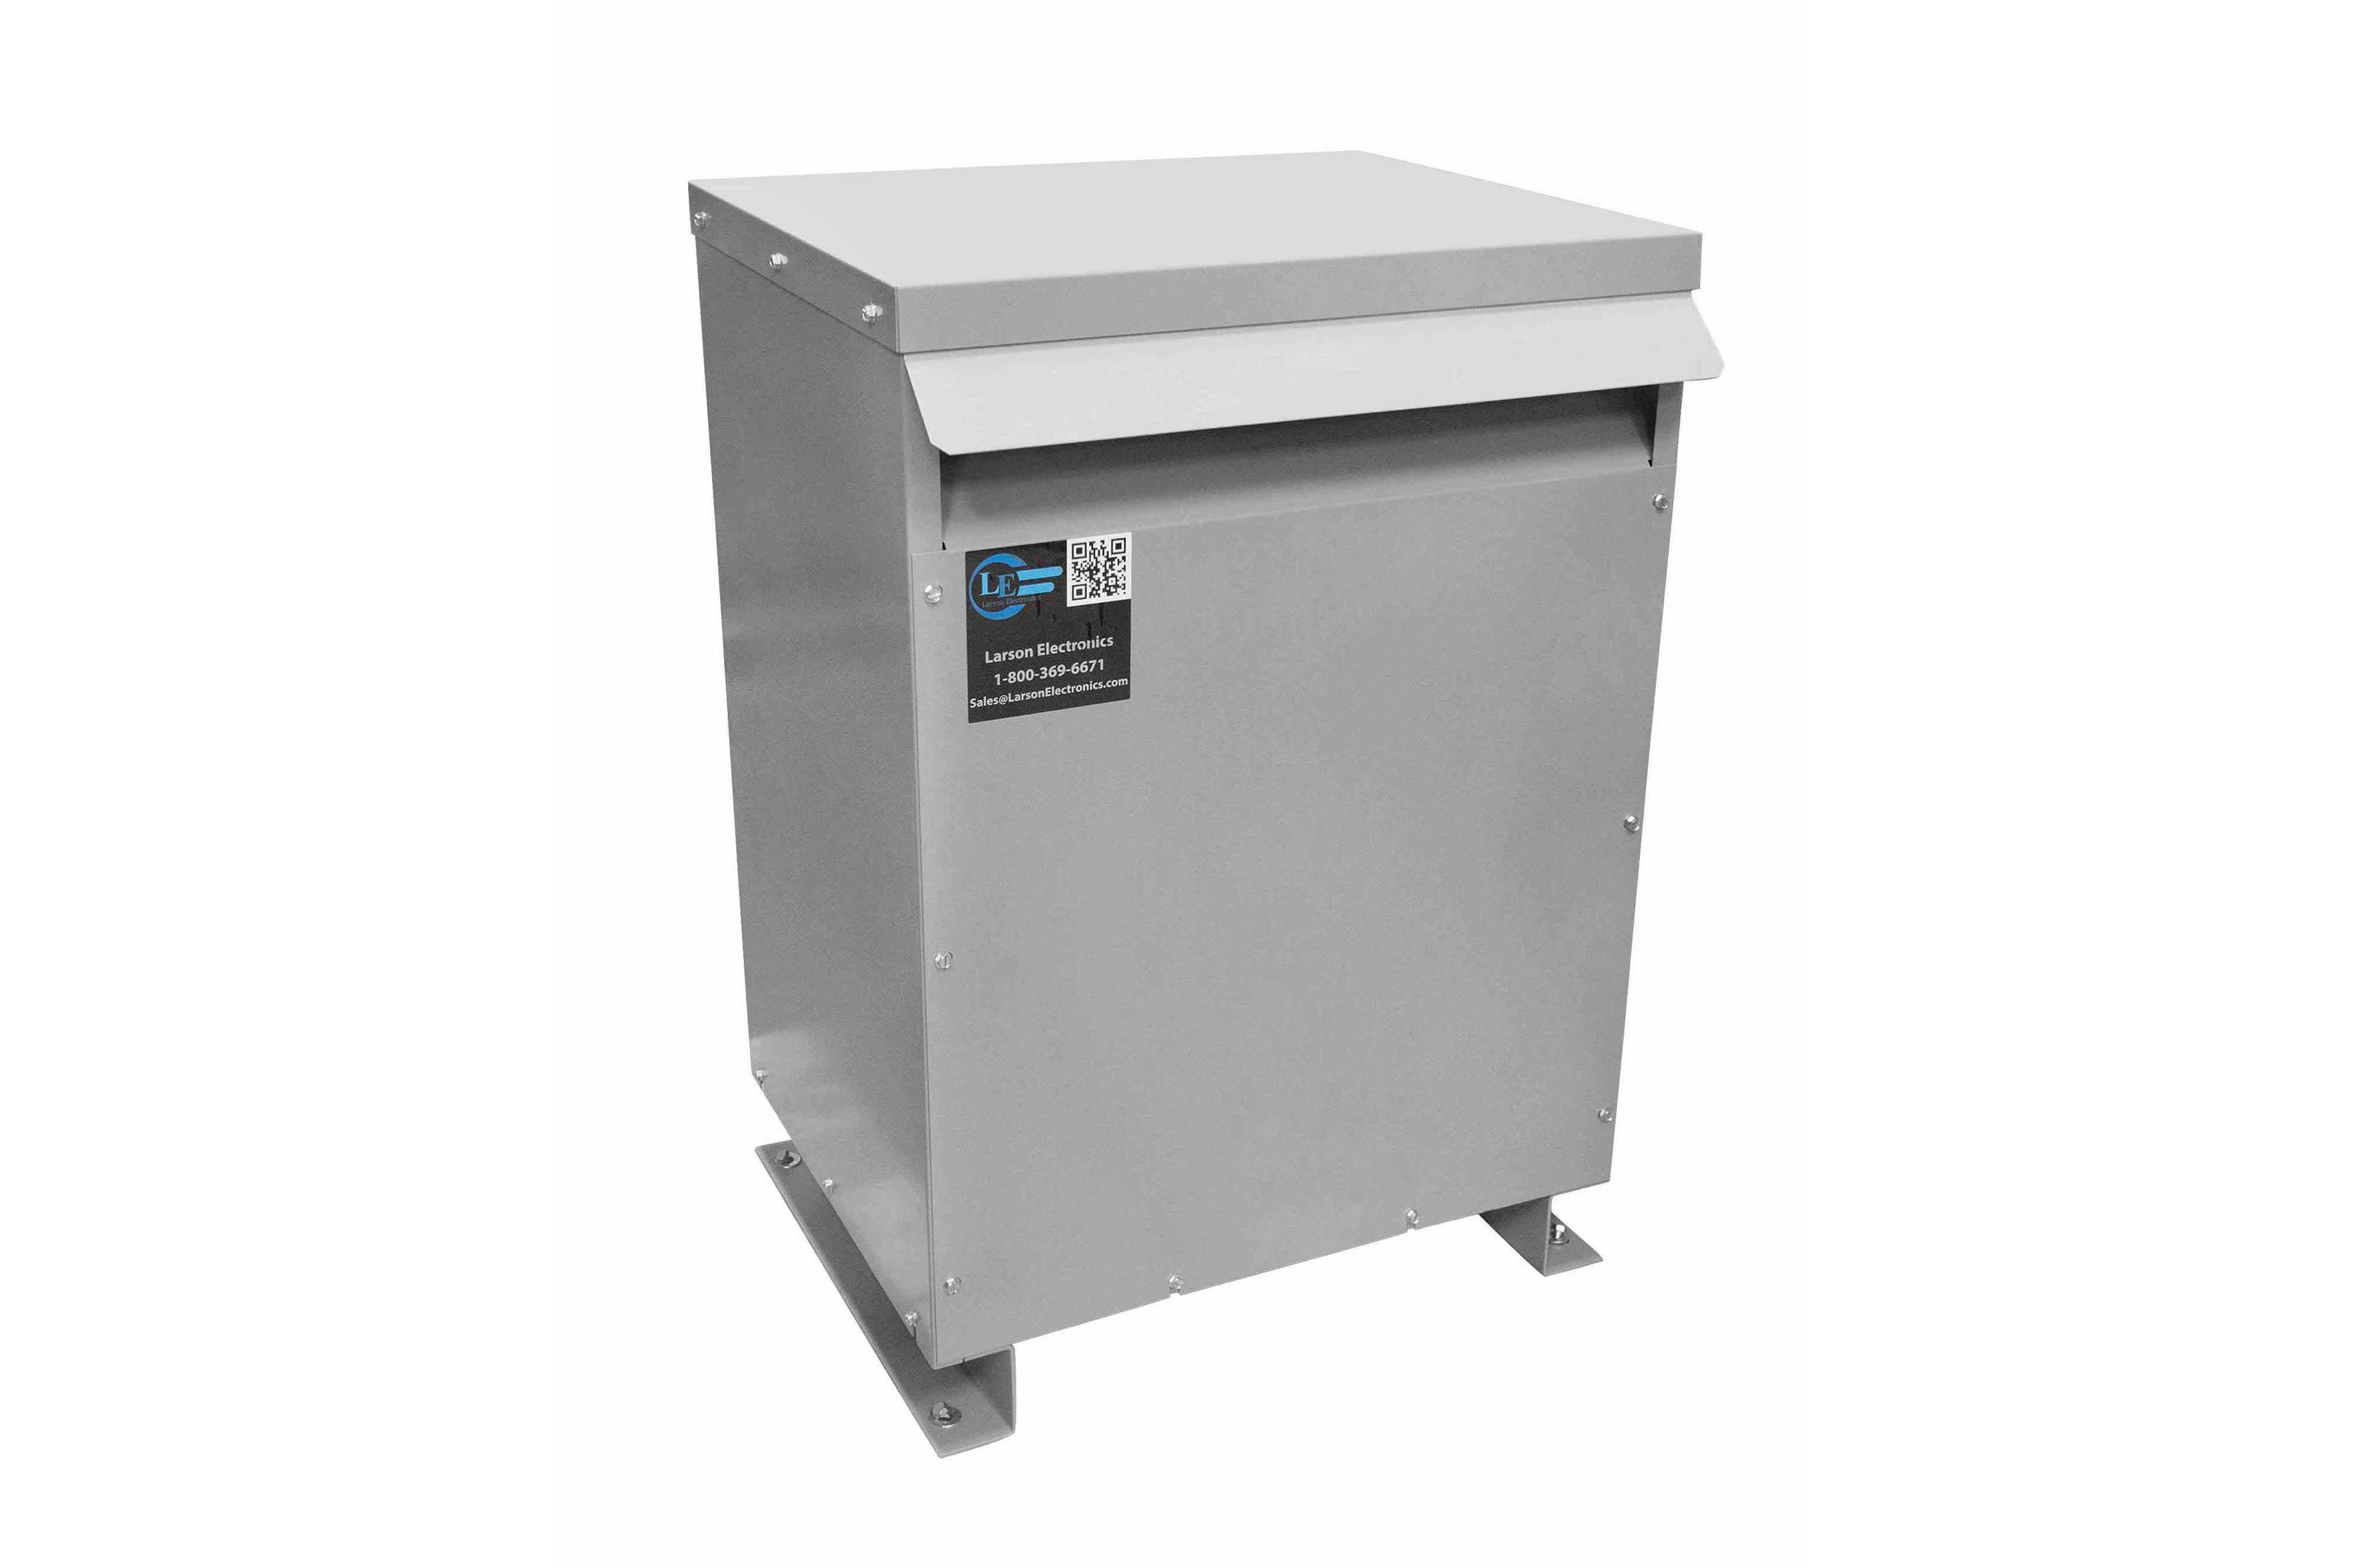 125 kVA 3PH Isolation Transformer, 460V Wye Primary, 240V/120 Delta Secondary, N3R, Ventilated, 60 Hz